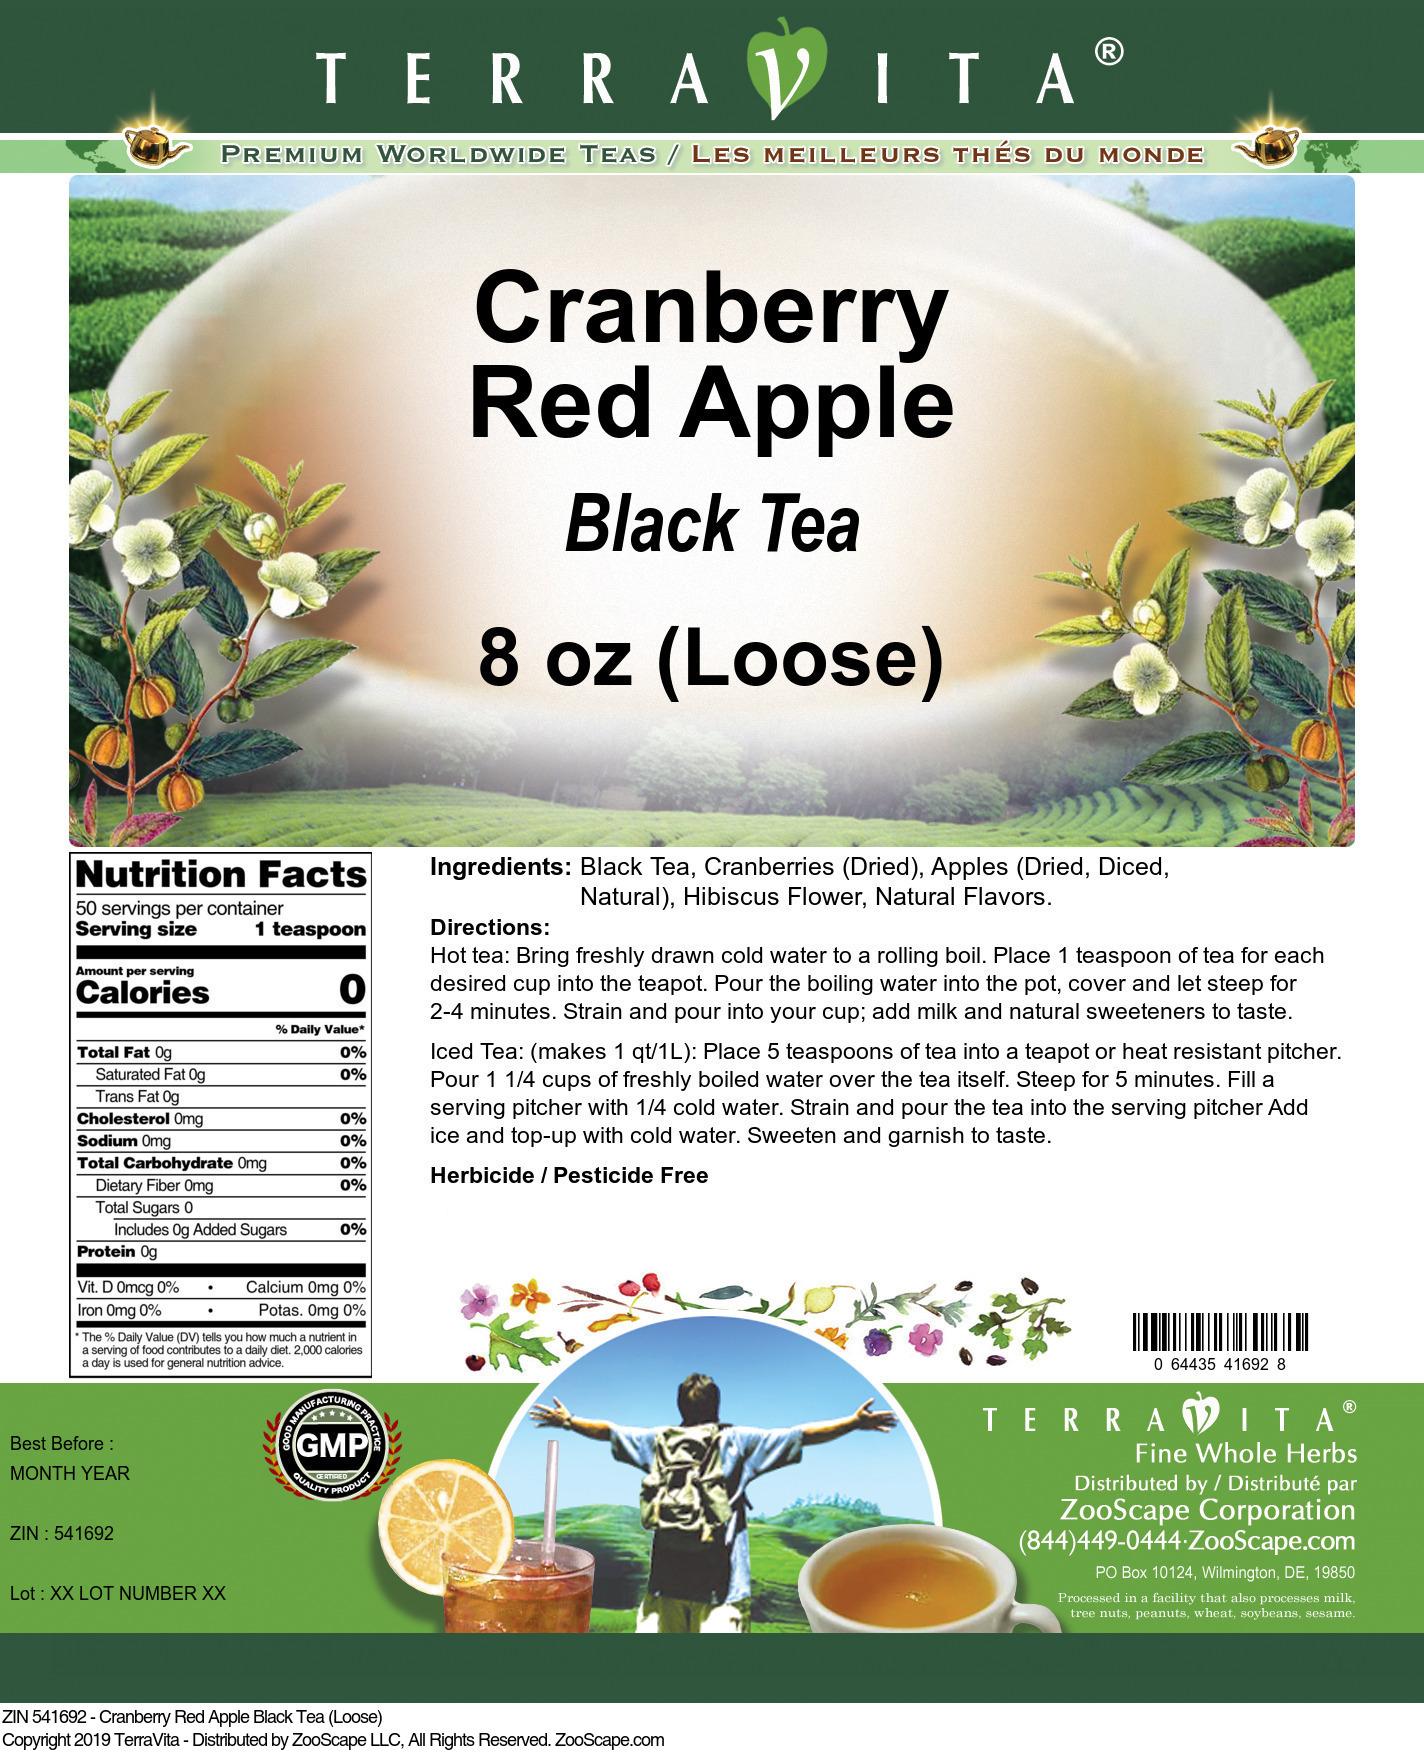 Cranberry Red Apple Black Tea (Loose)